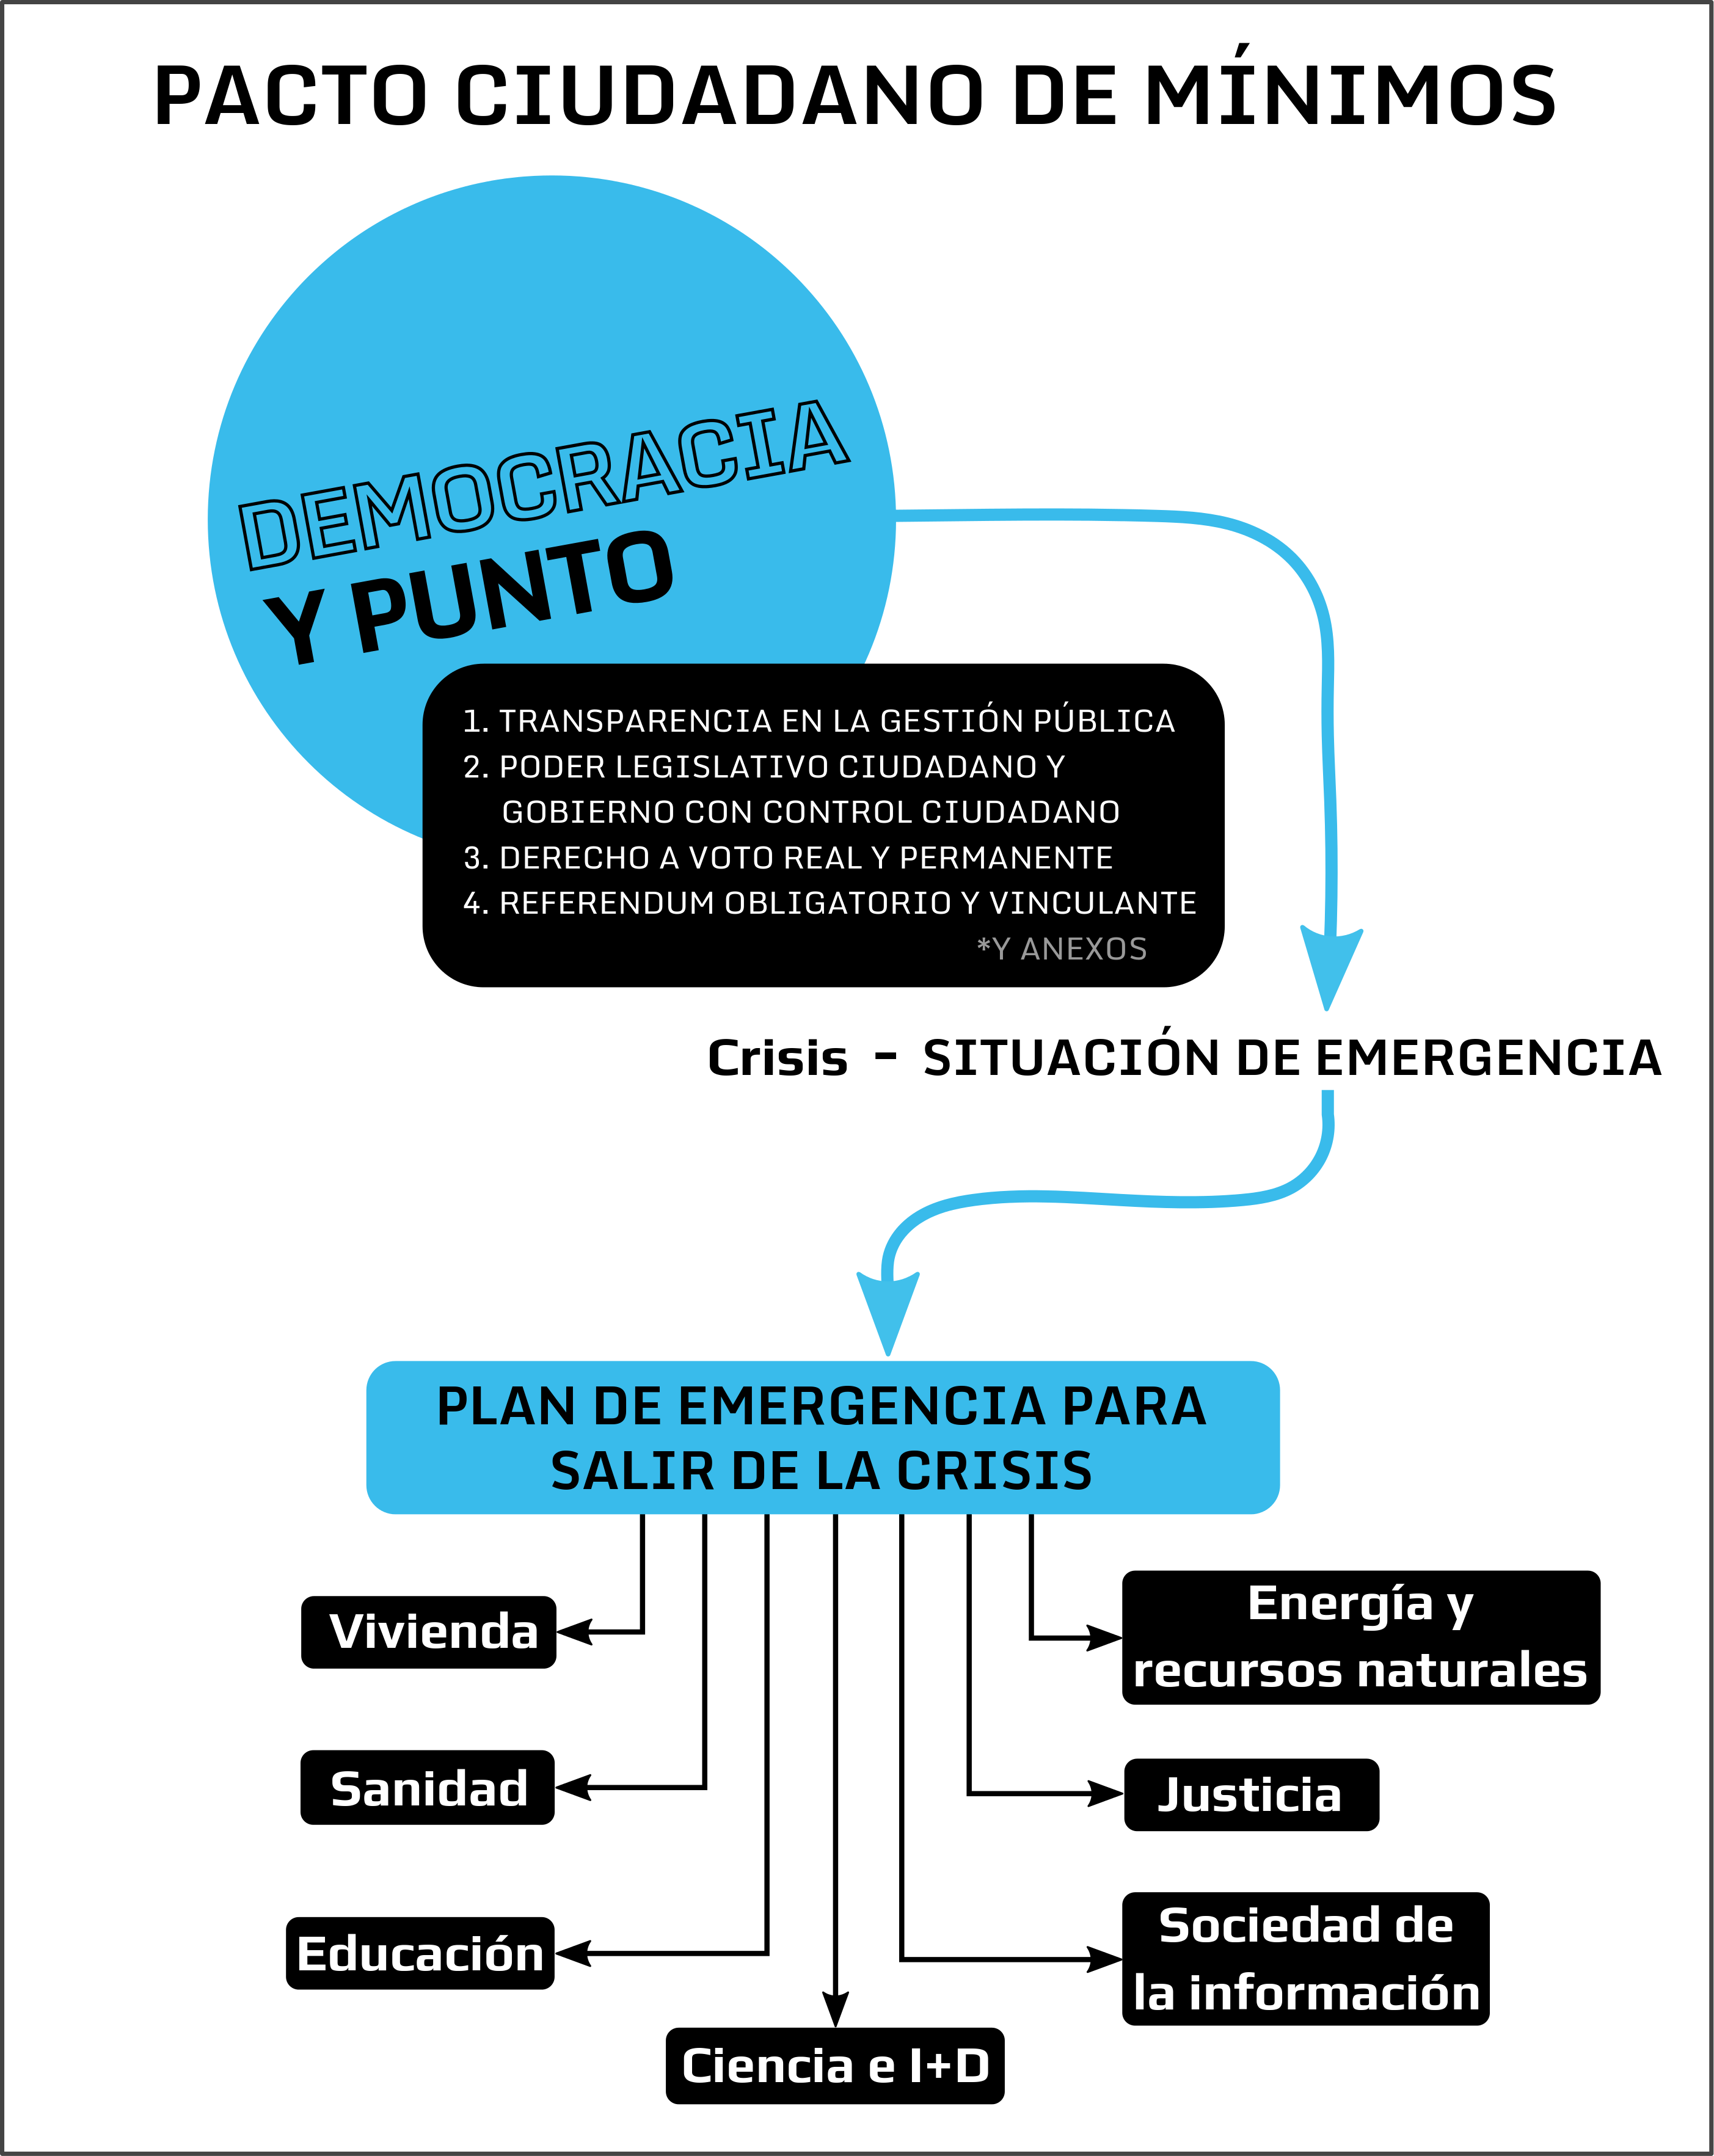 http://partidox.org/wp-content/uploads/2013/11/11-2013-EsquemaContenidos_v2.png